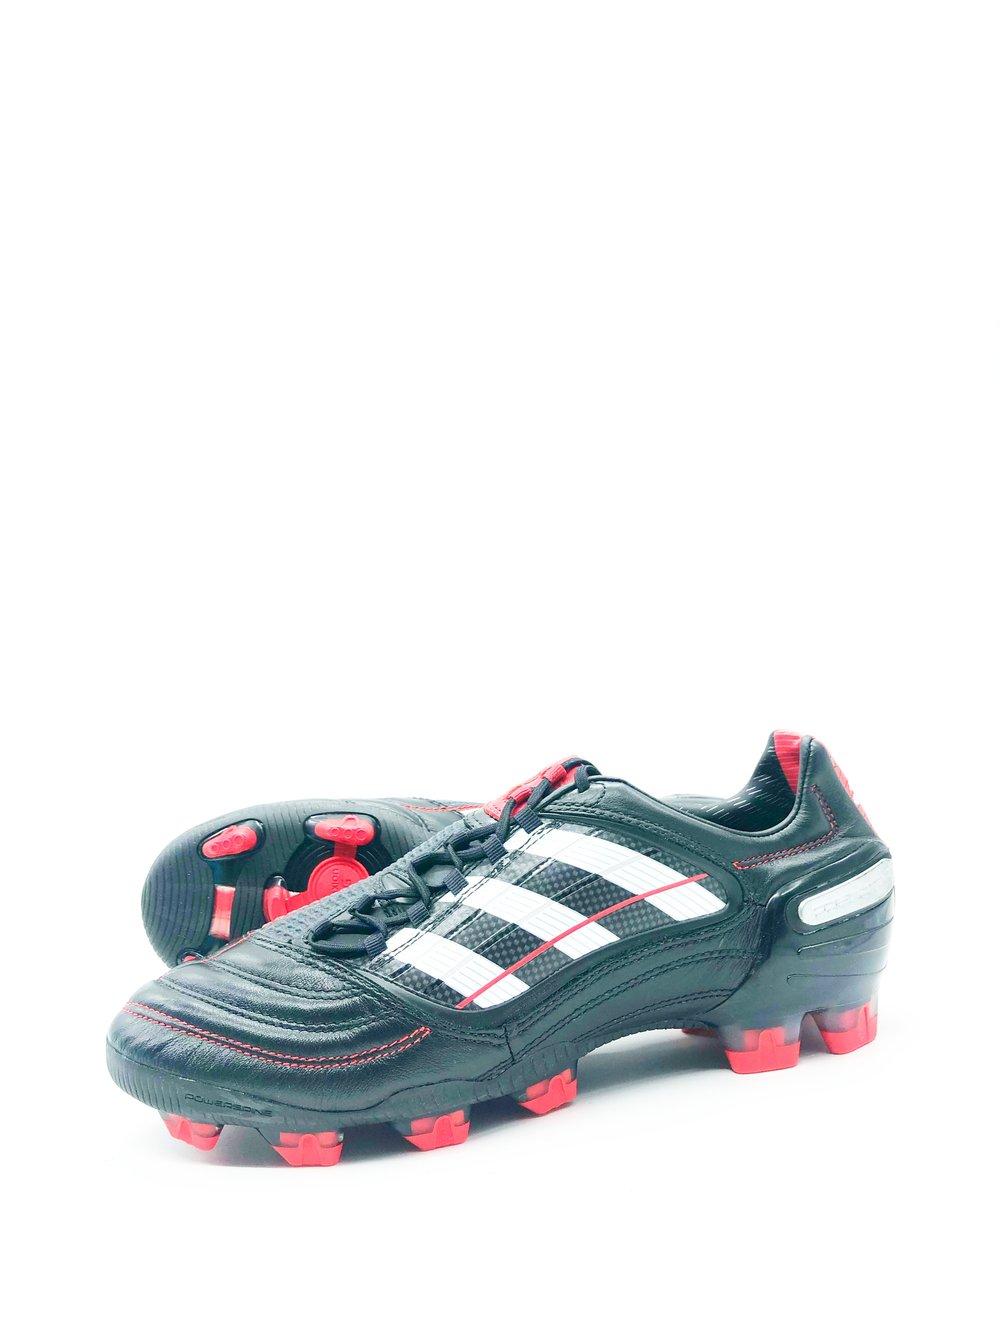 Image of Adidas predator X  classic